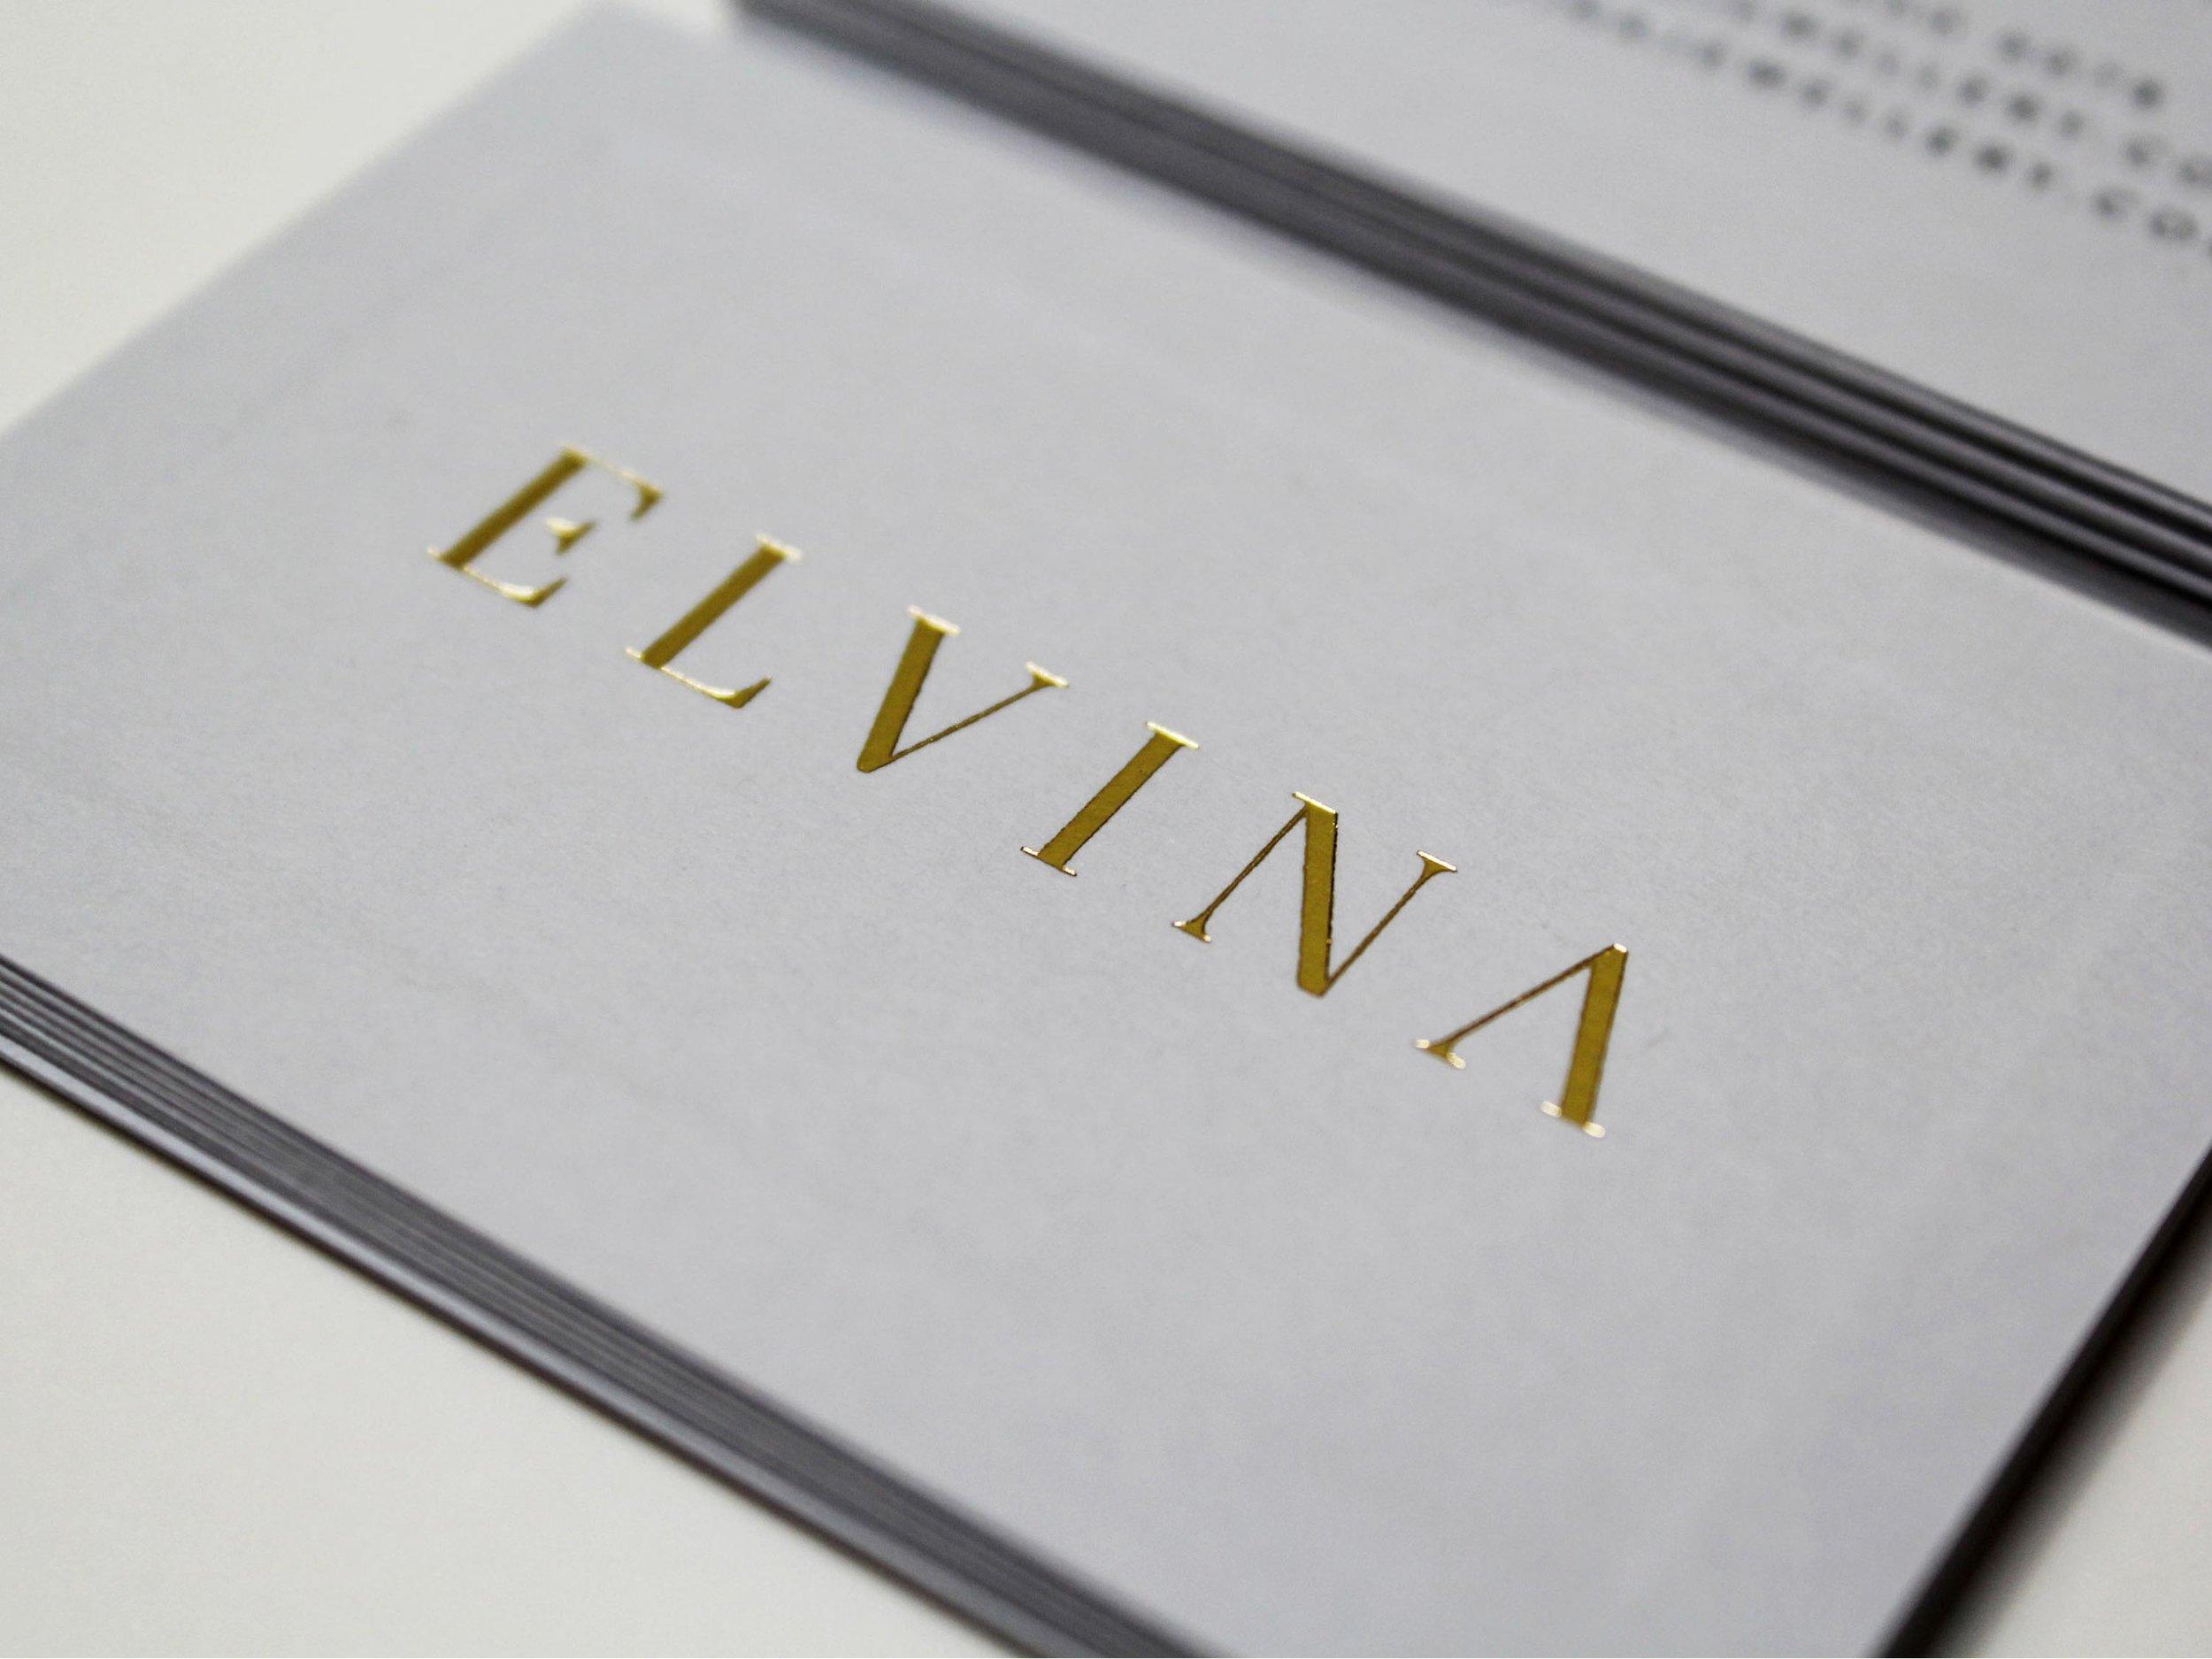 Elvina_Busness-Card_01.jpg